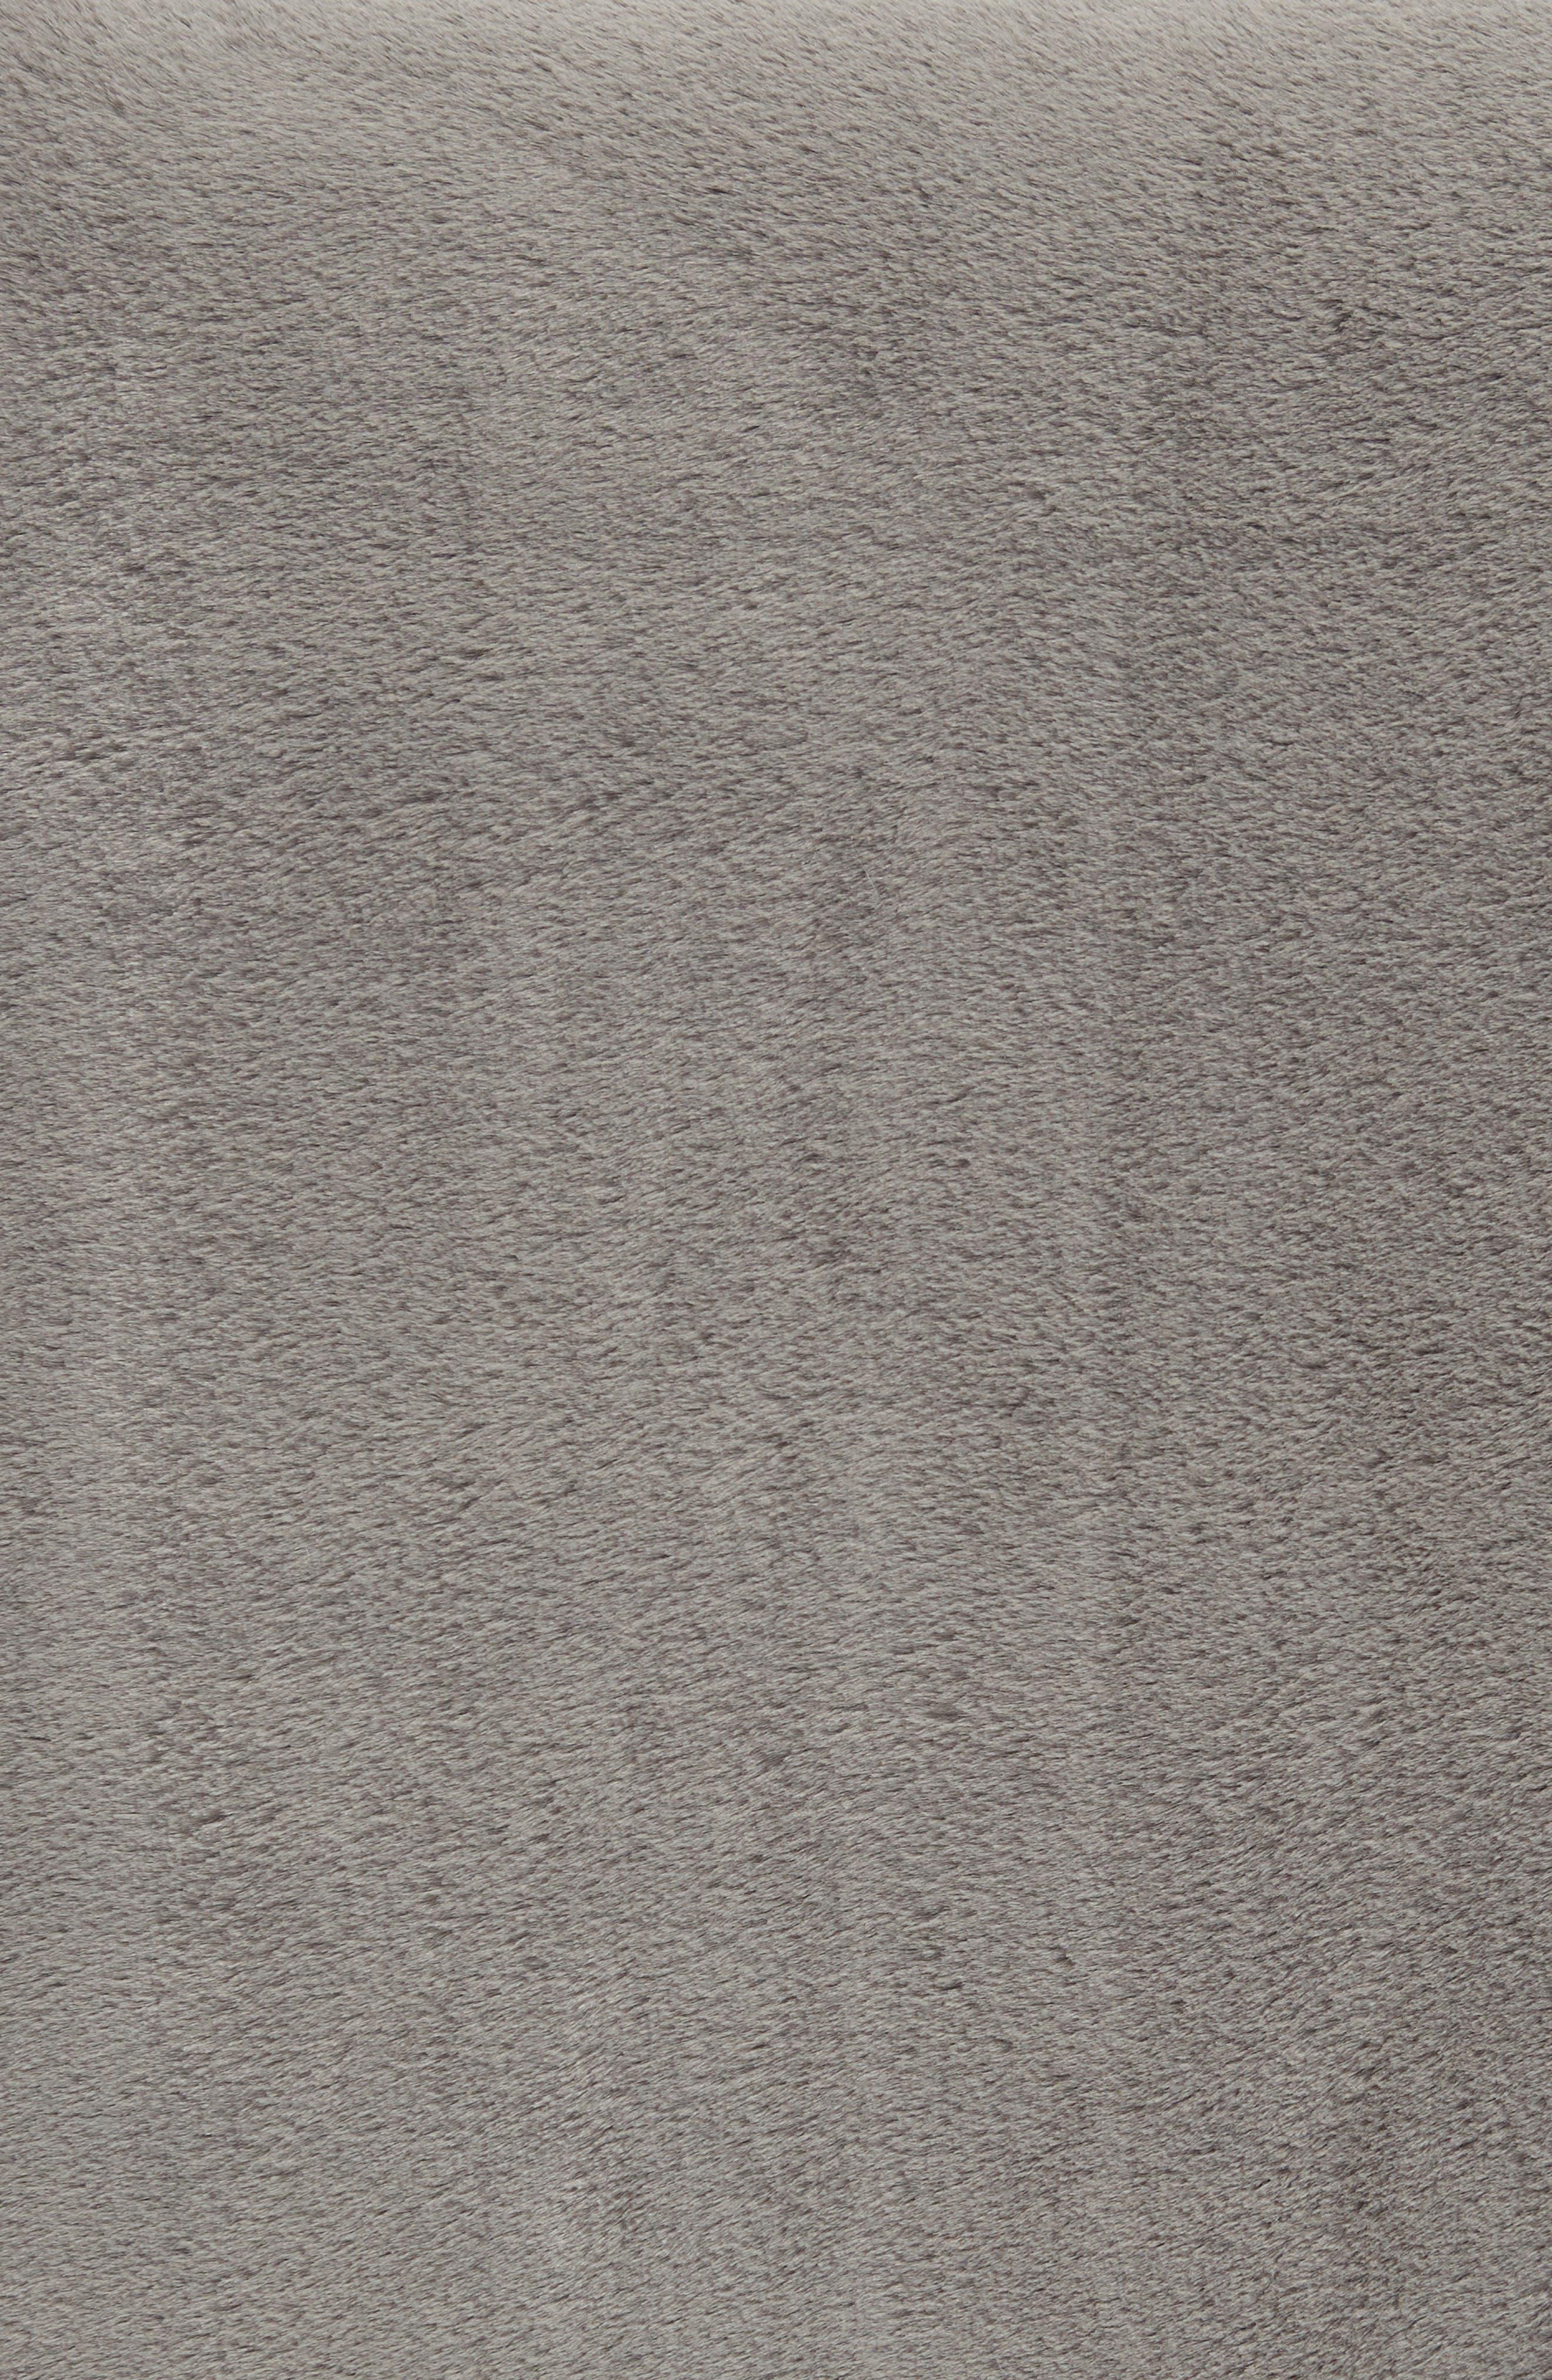 Reversible Plush Throw Blanket,                             Alternate thumbnail 2, color,                             GREY FROST